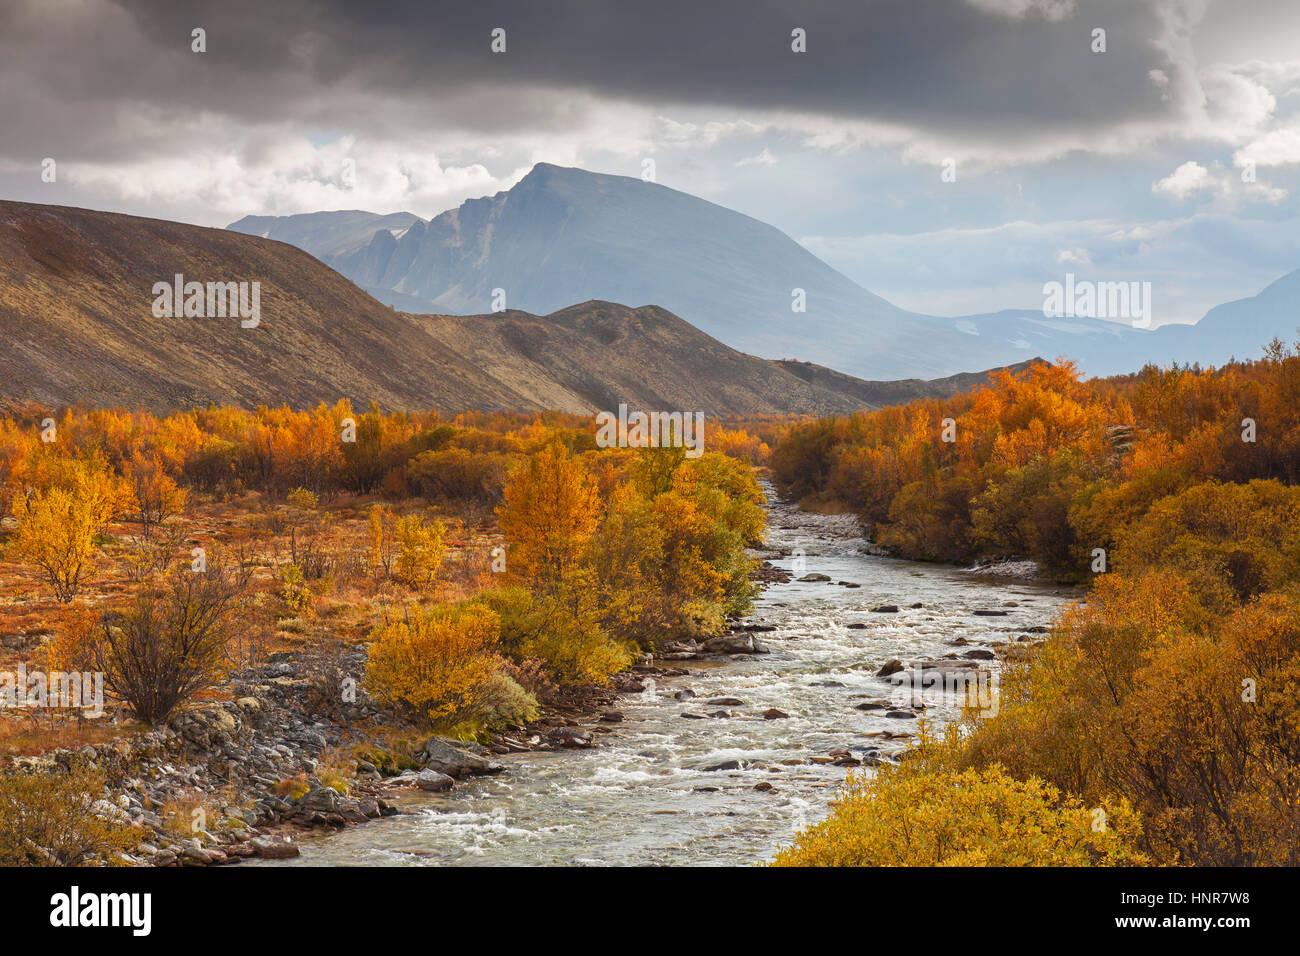 River Atna at Dørålseter / Doralseter in the Rondane National Park in autumn, Dovre, Norway, Scandinavia - Stock Image